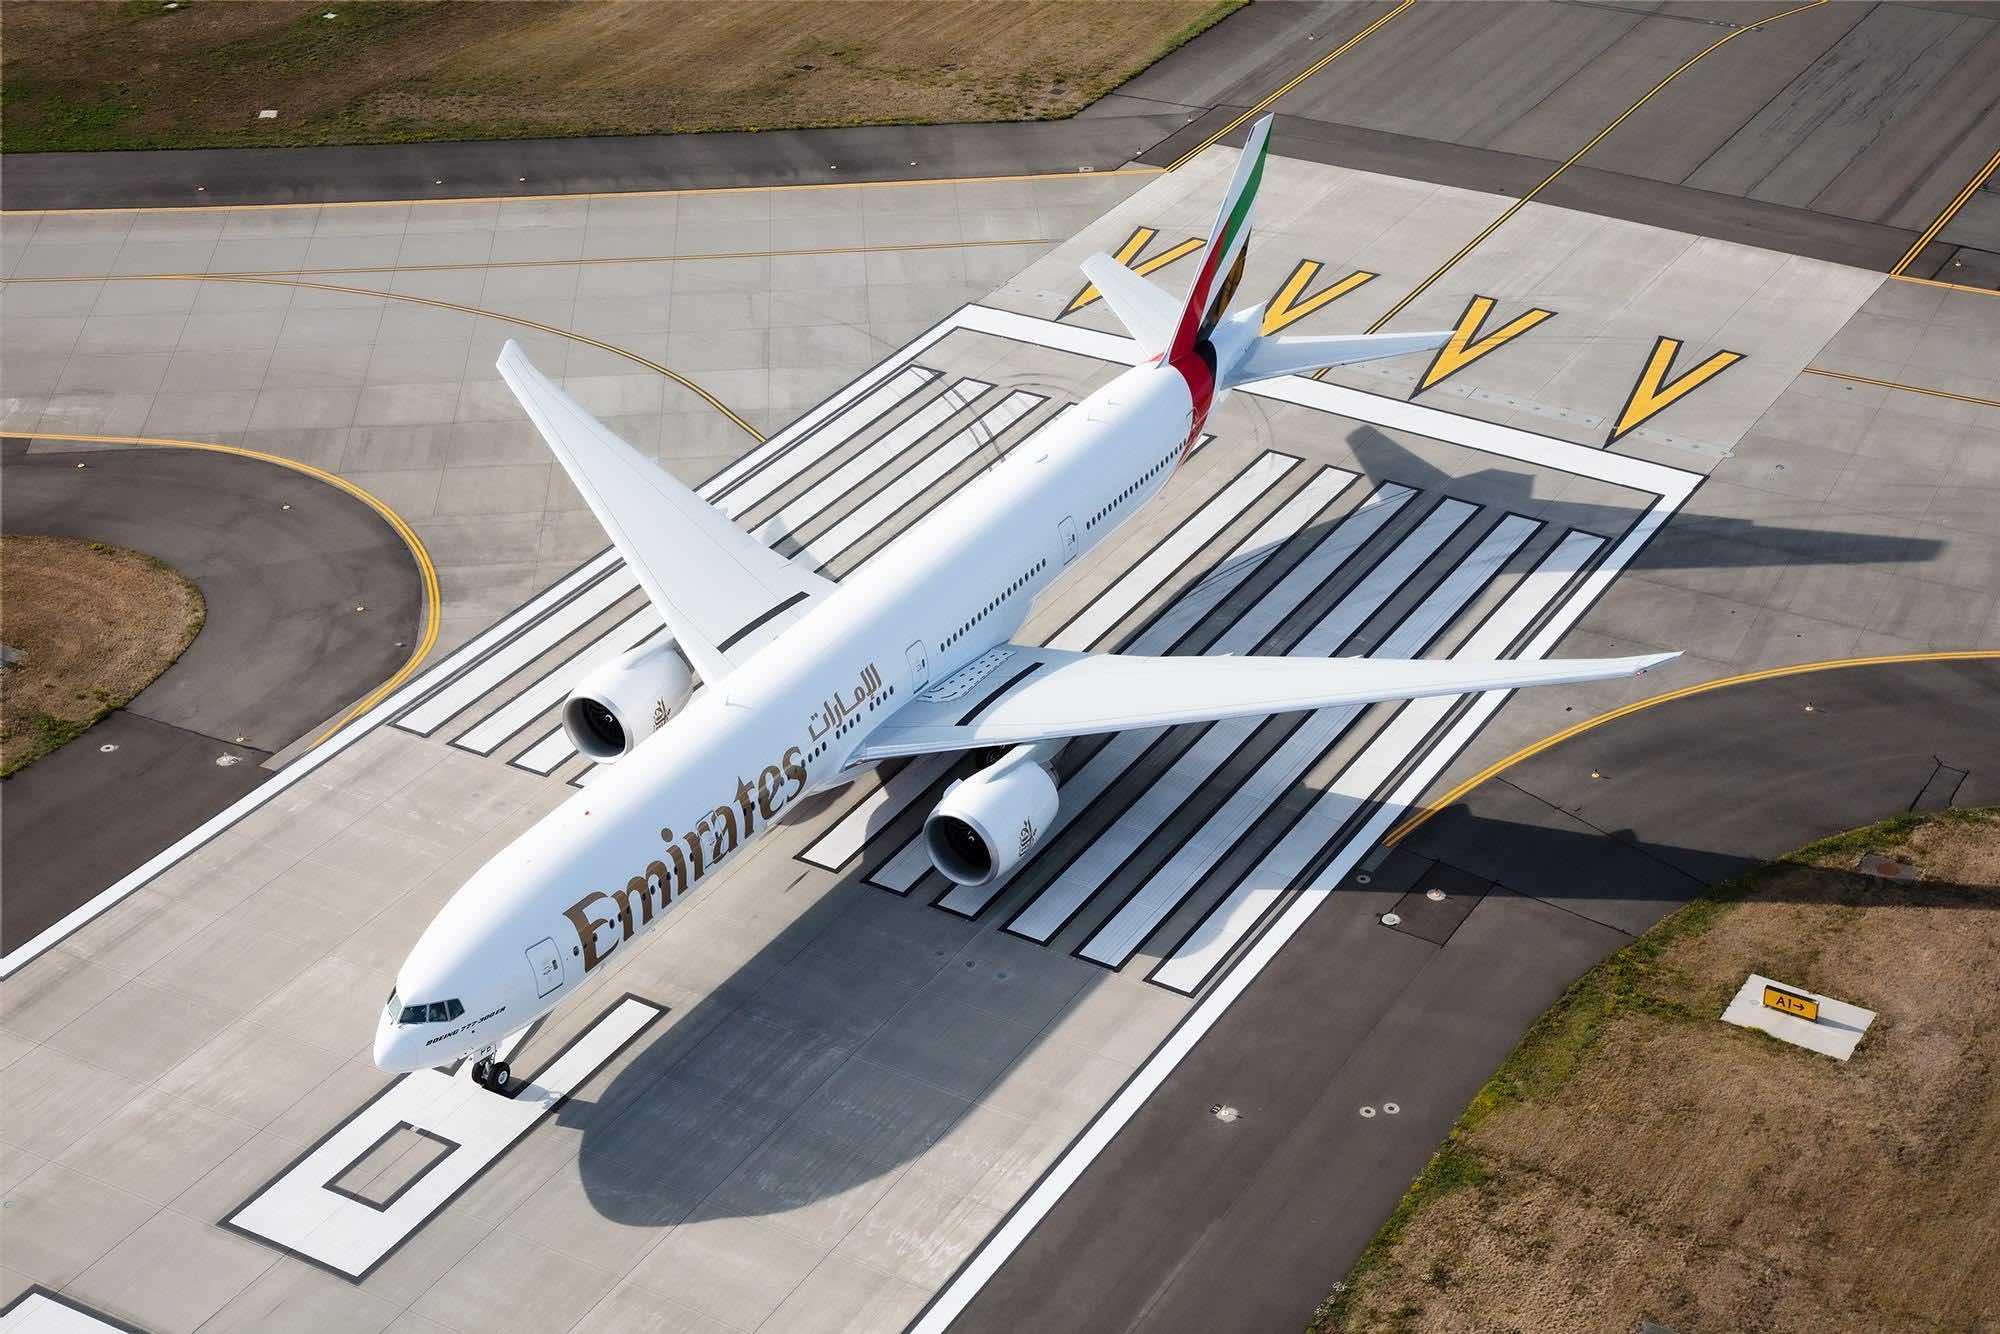 Emirates B777-300ER